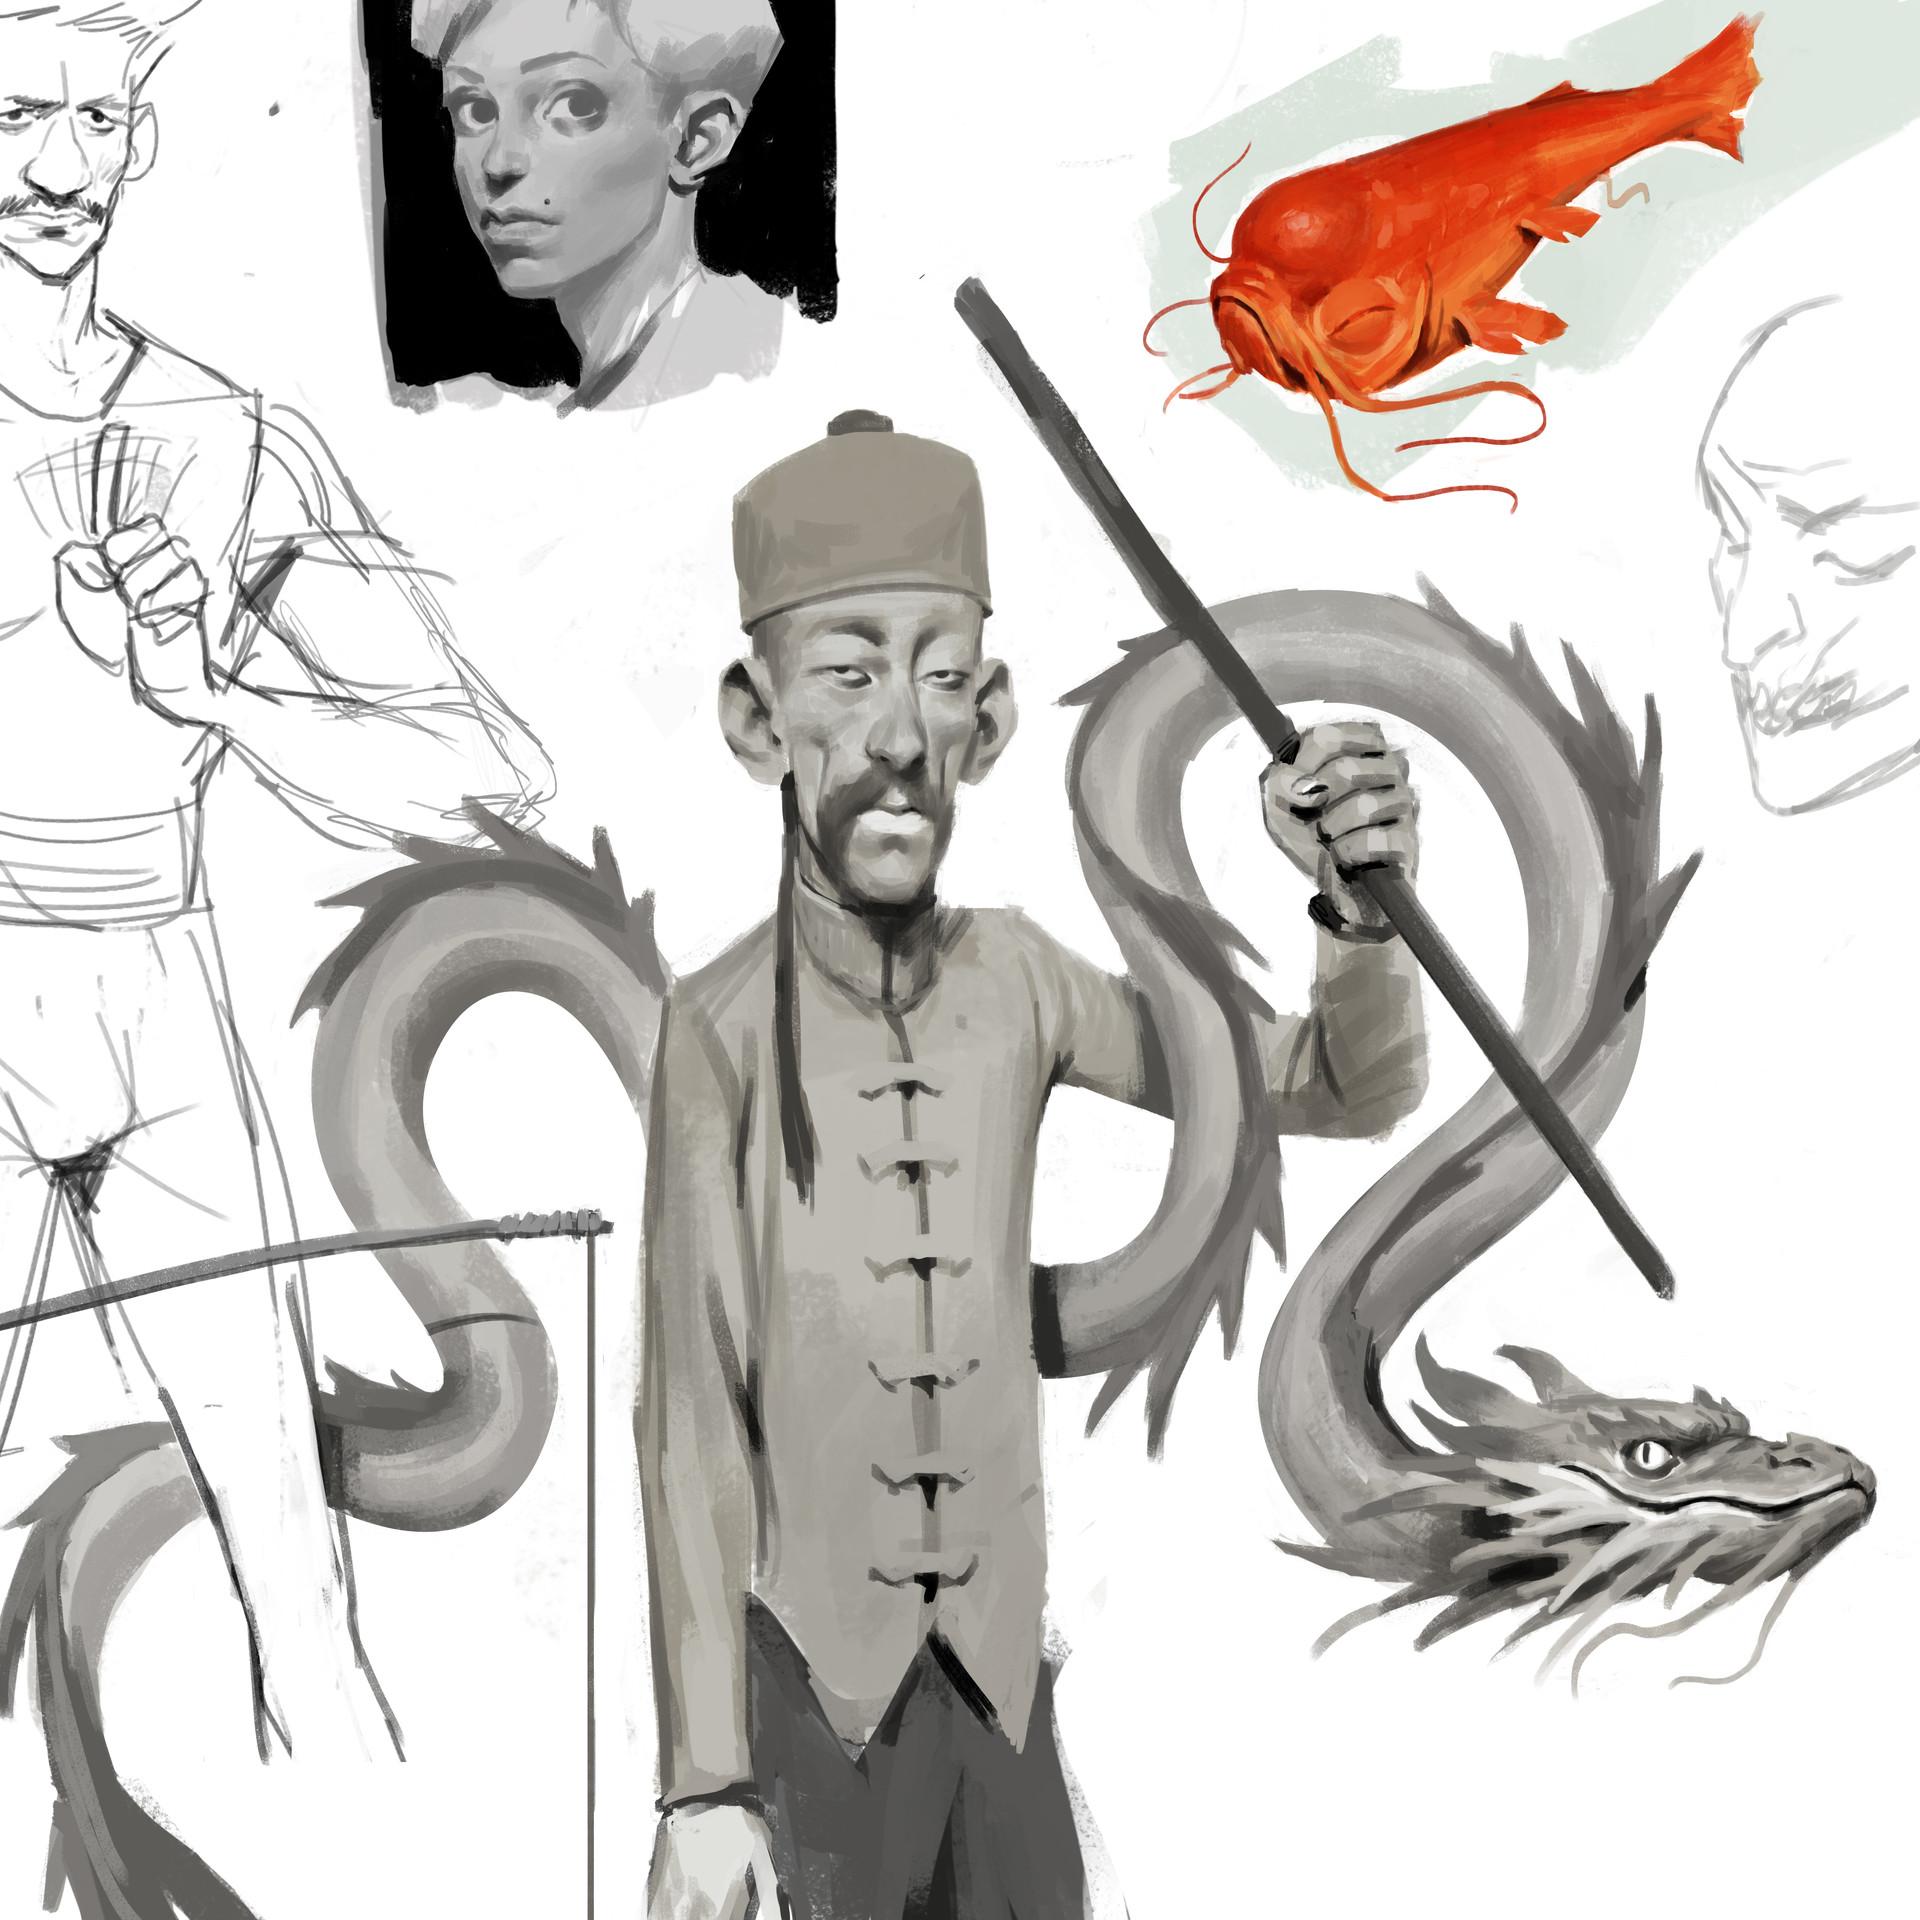 Jens claessens sketchbook4